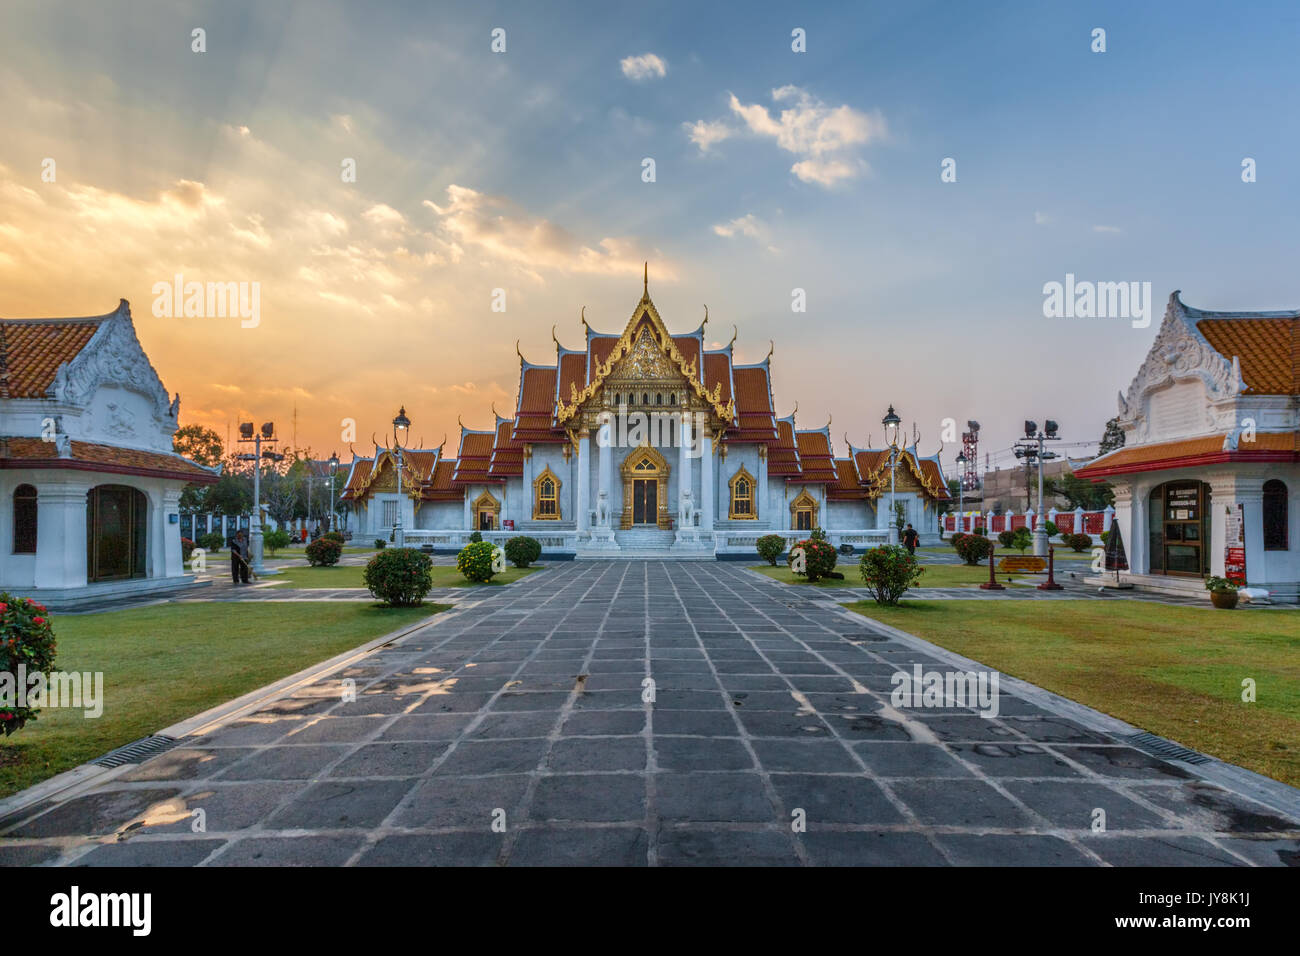 The Marble Temple at sunset, Bangkok, Thailand - Stock Image